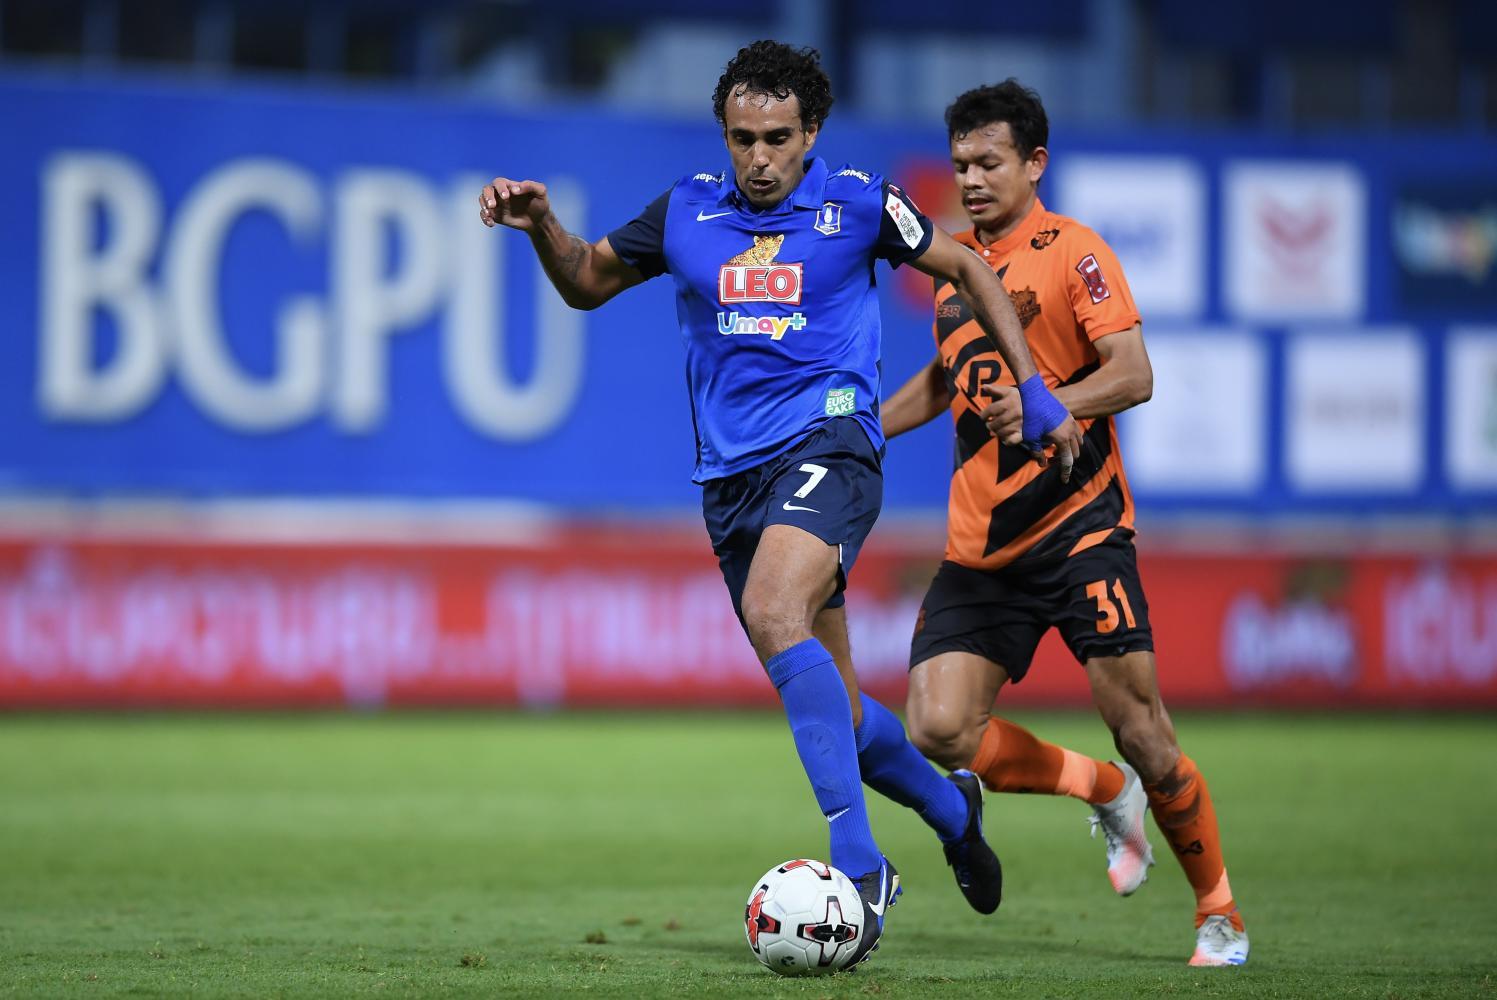 BG Pathum United striker Diogo Luis Santo (left) in action during a recent Thai League 1 match.